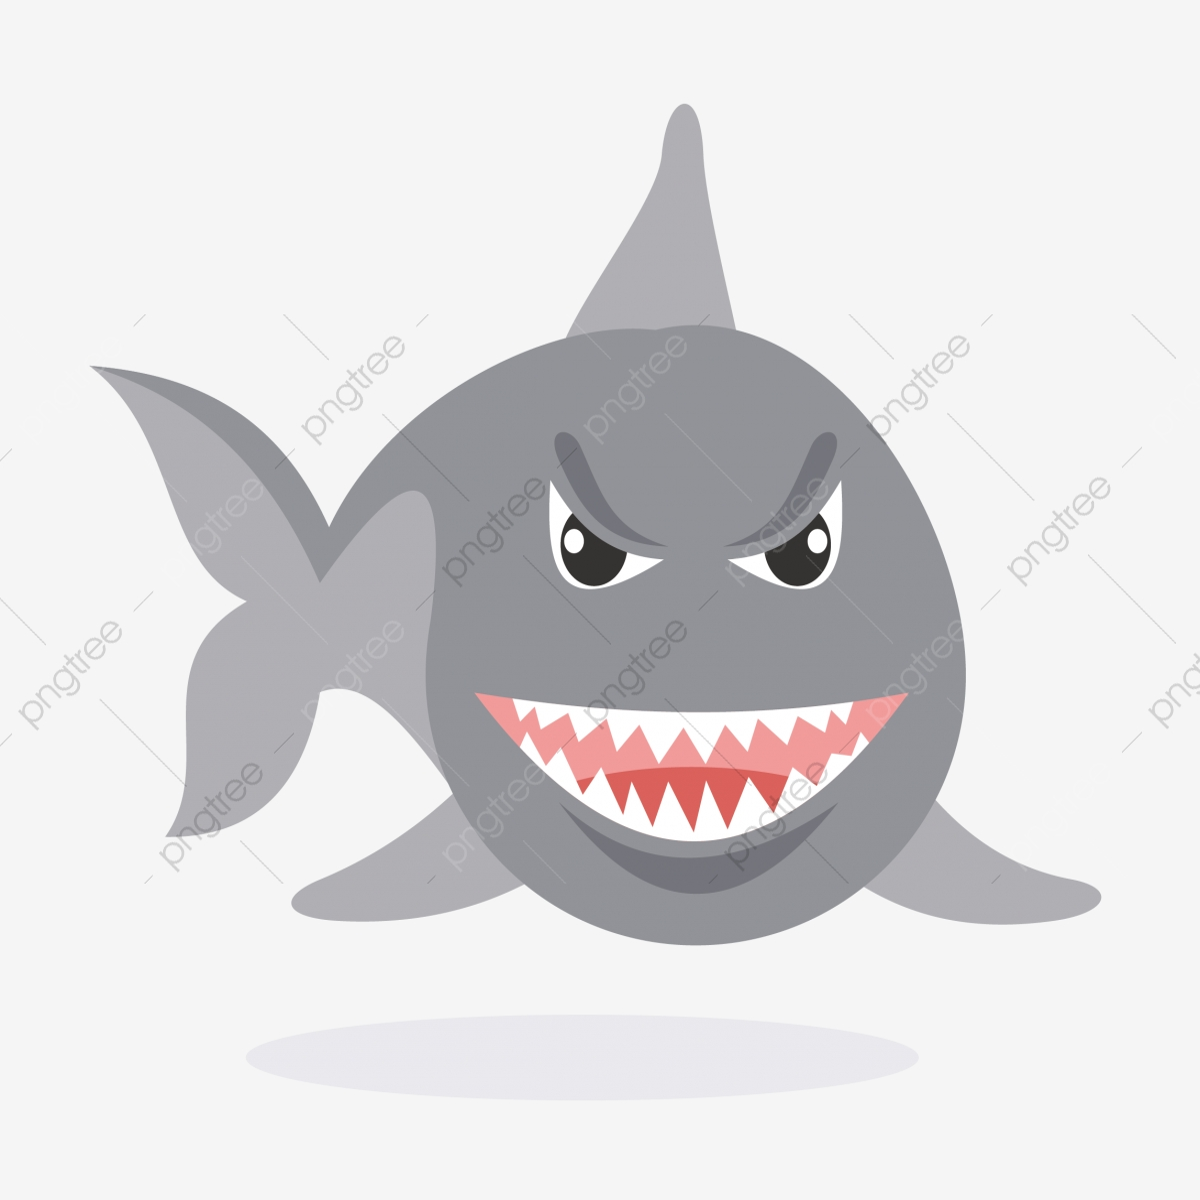 requin gris requin gris grand requin requin de dessin